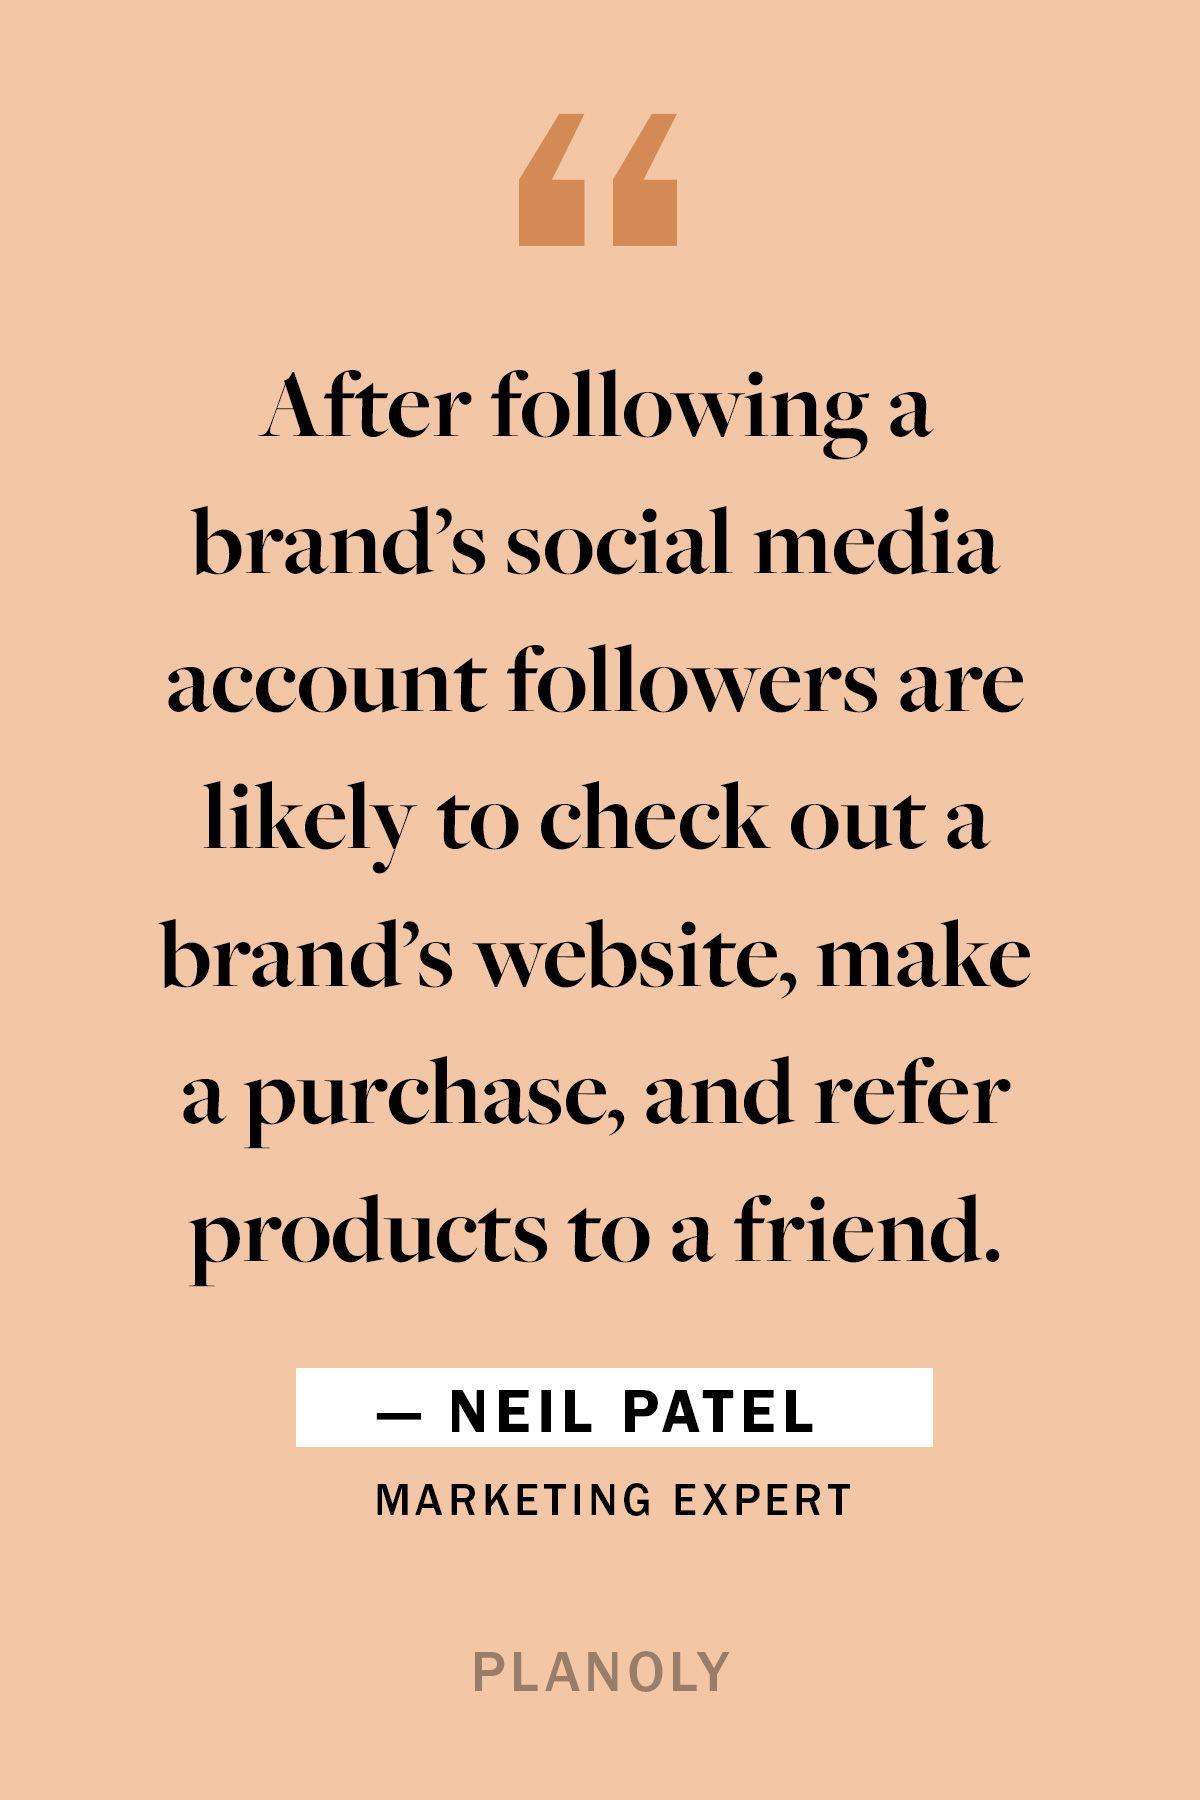 PLANOLY - Blog - Instagram for Business - Vertical - 2